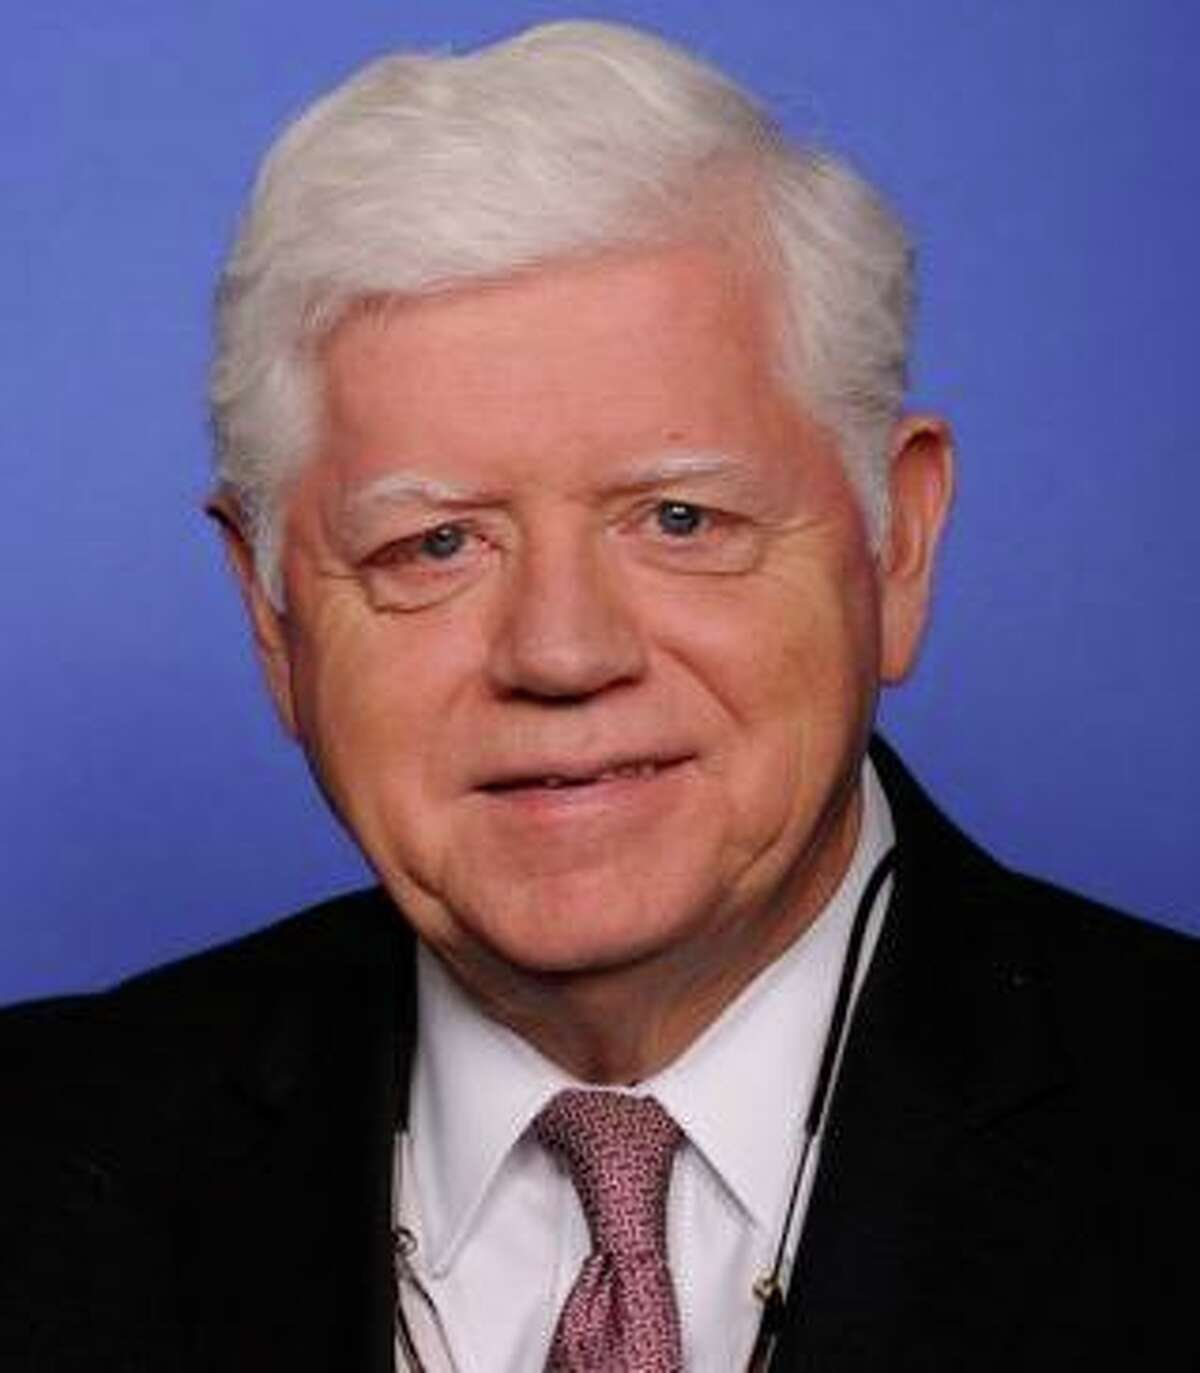 U.S. Rep. John B. Larson